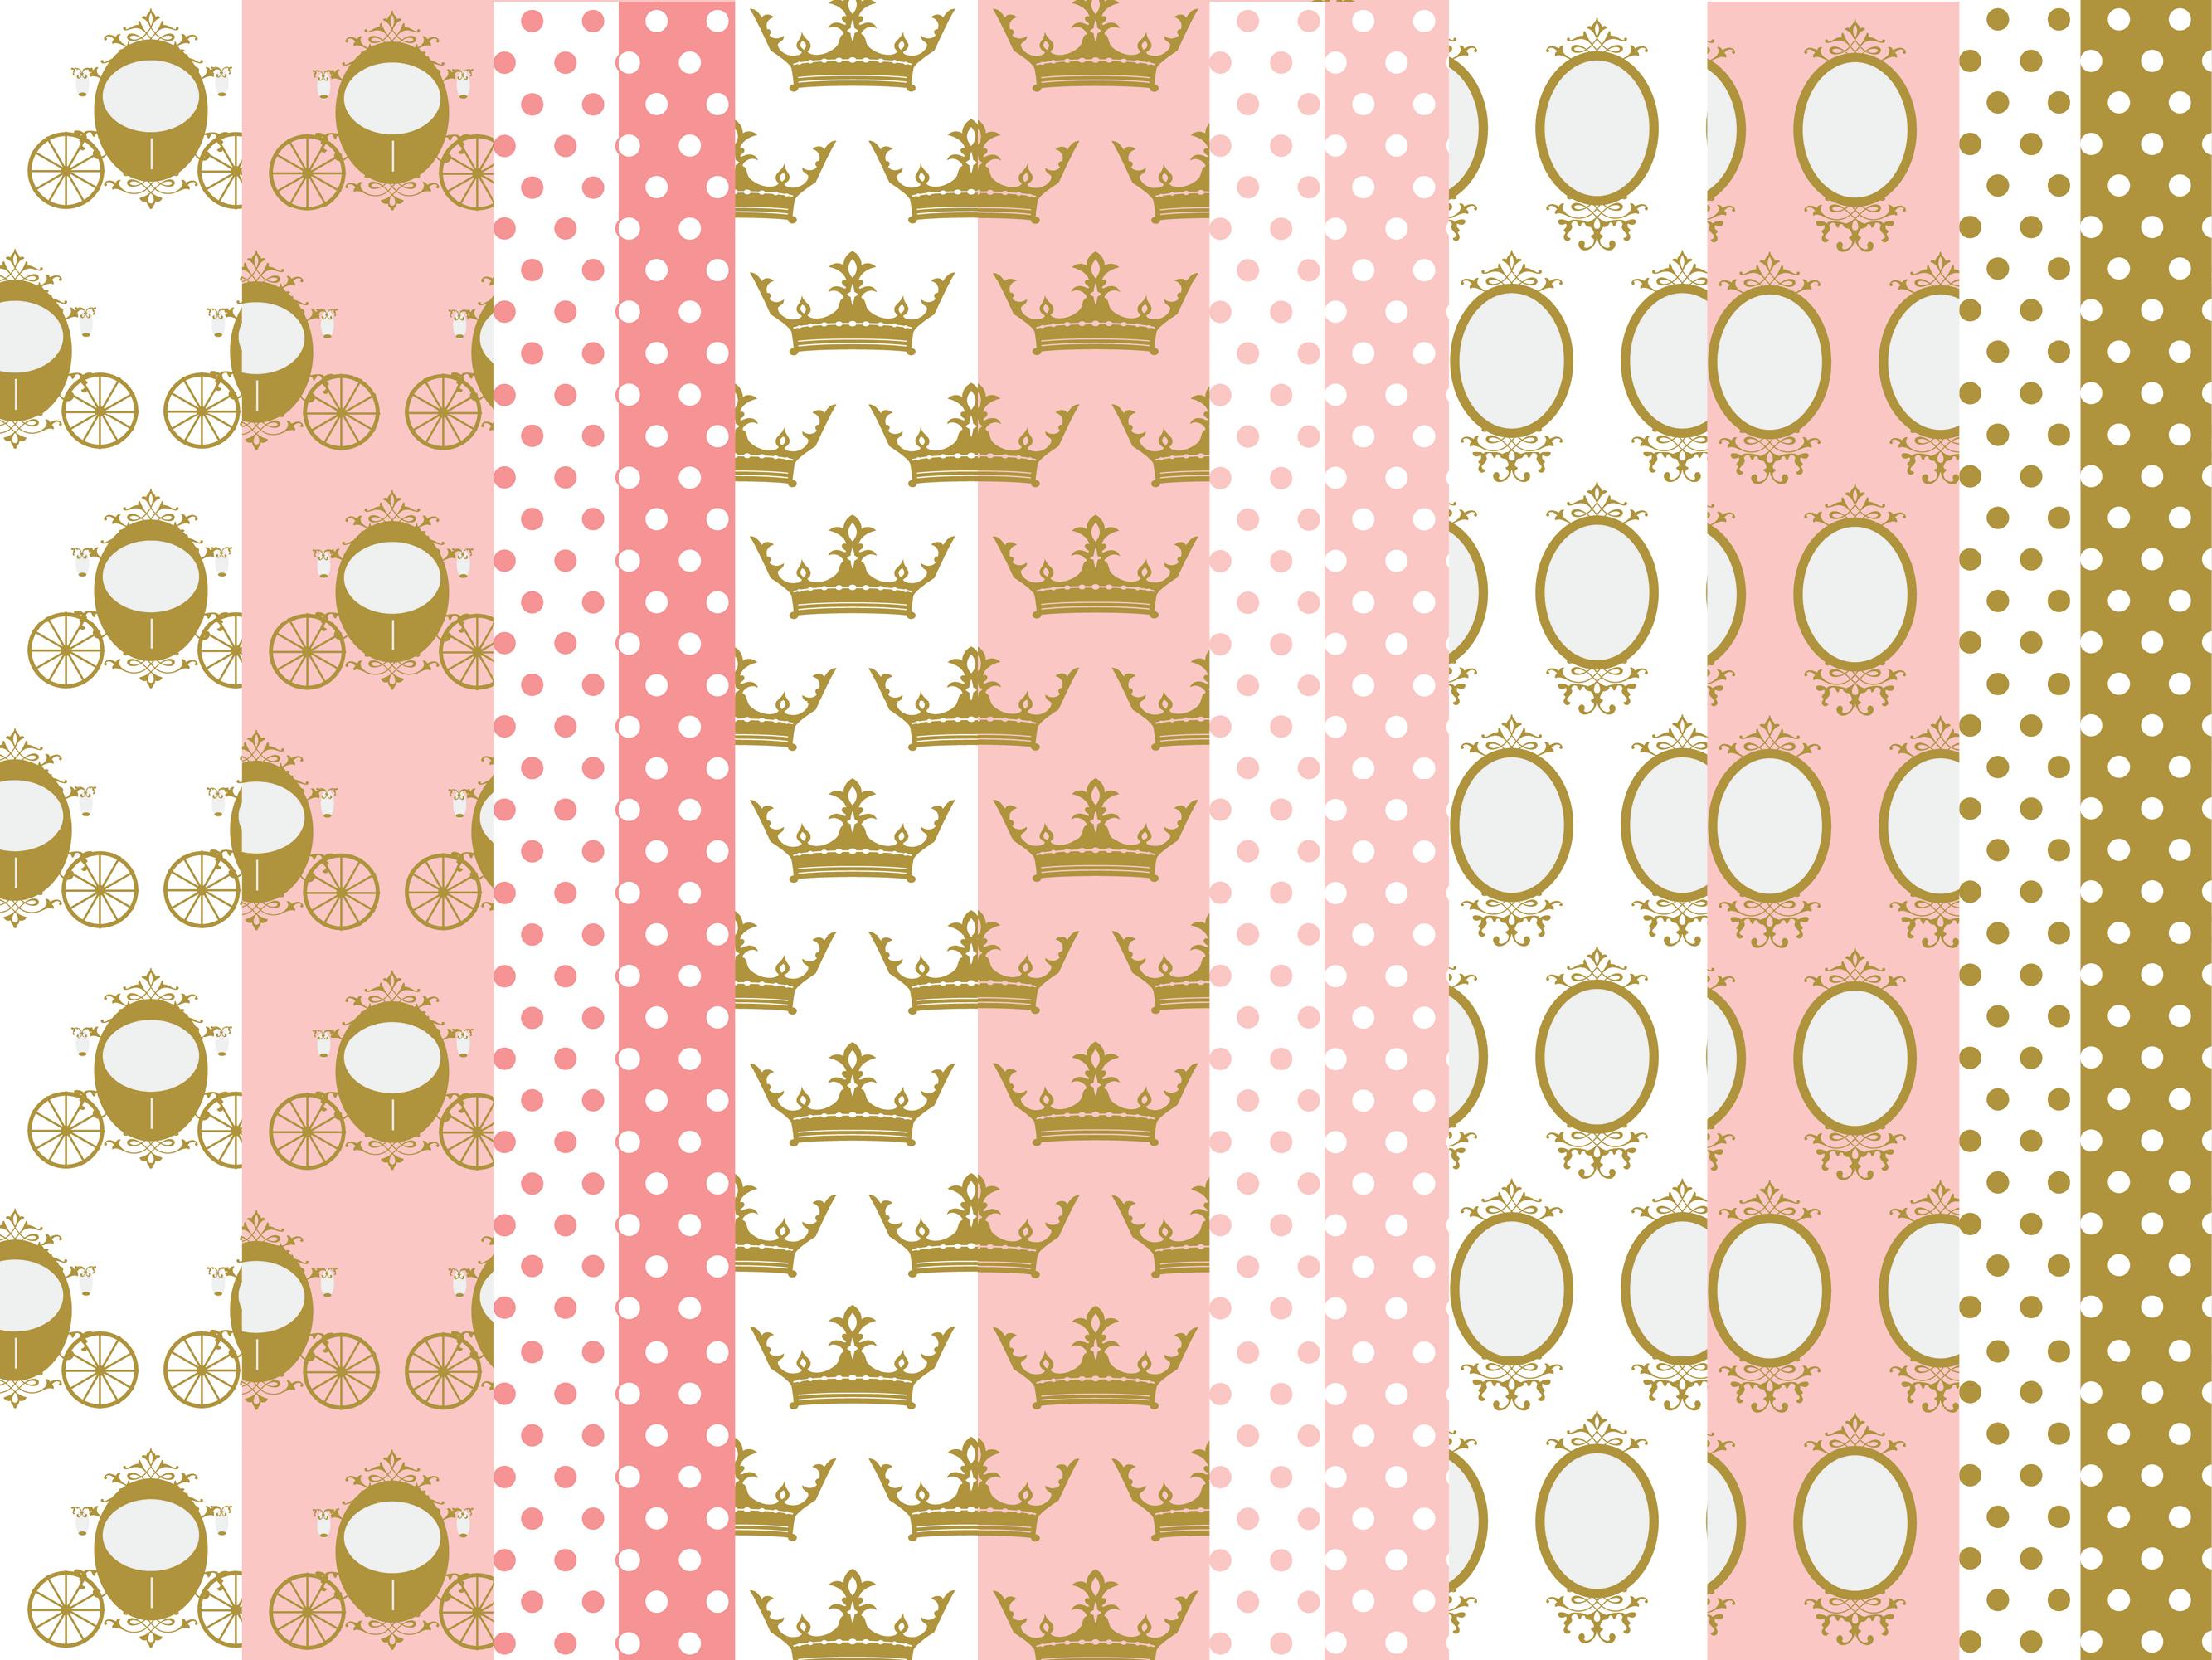 12 Scrapbook Papel Digital Princesa No Elo7 Loja Vinmo 827a62